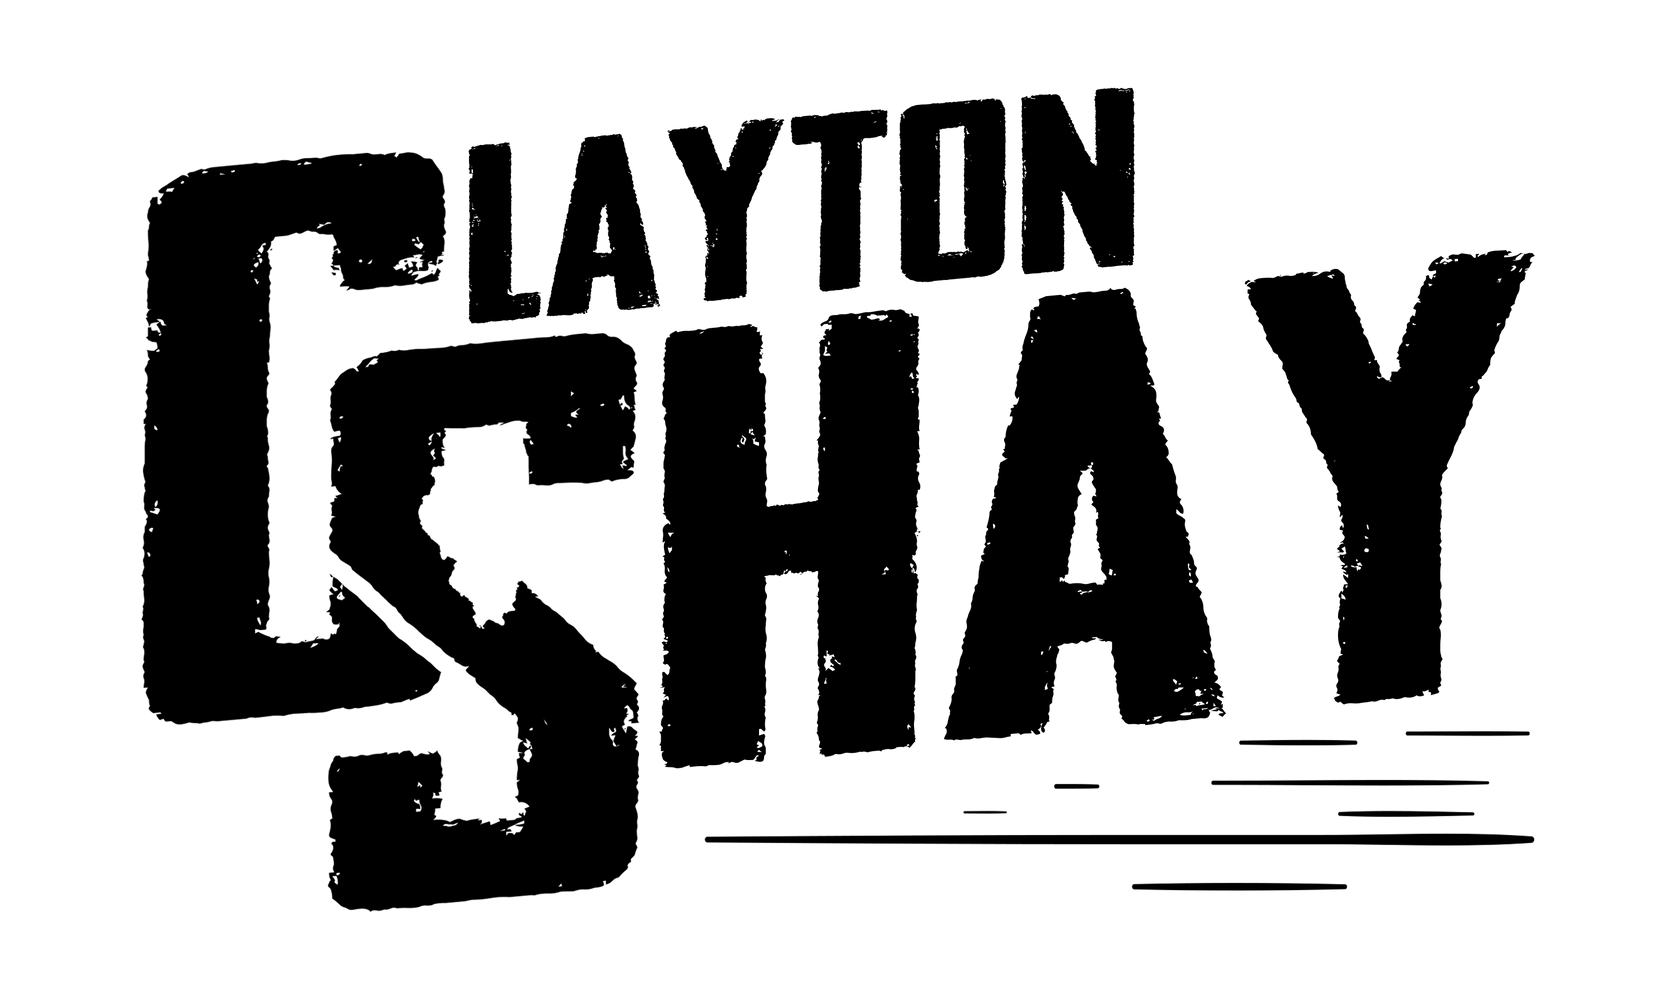 FULL-FONT-BLACK-TRANSPARENT.png